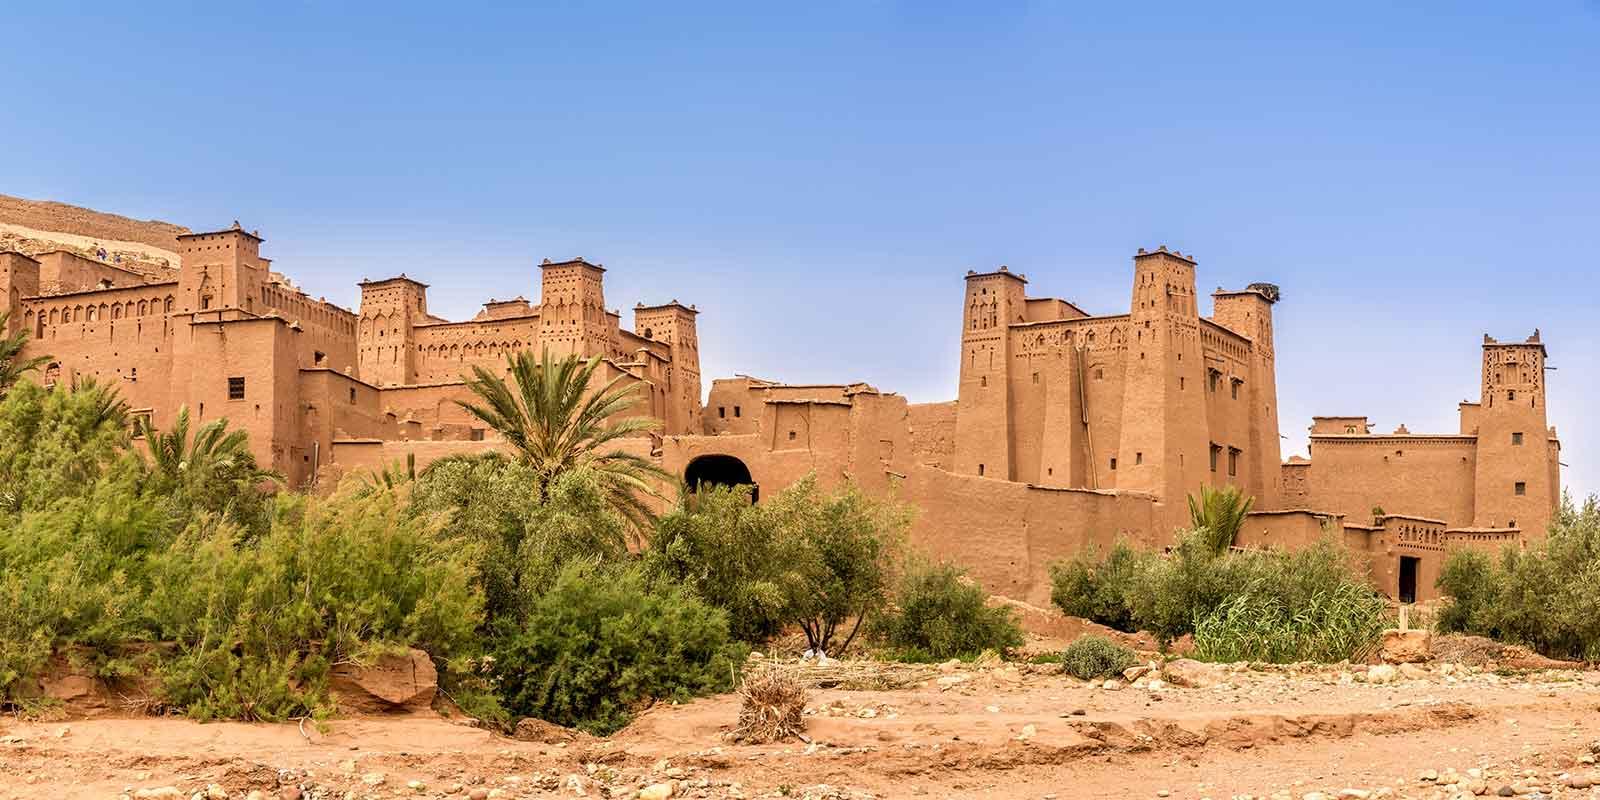 Ait Benhaddou kasbah in Morocco